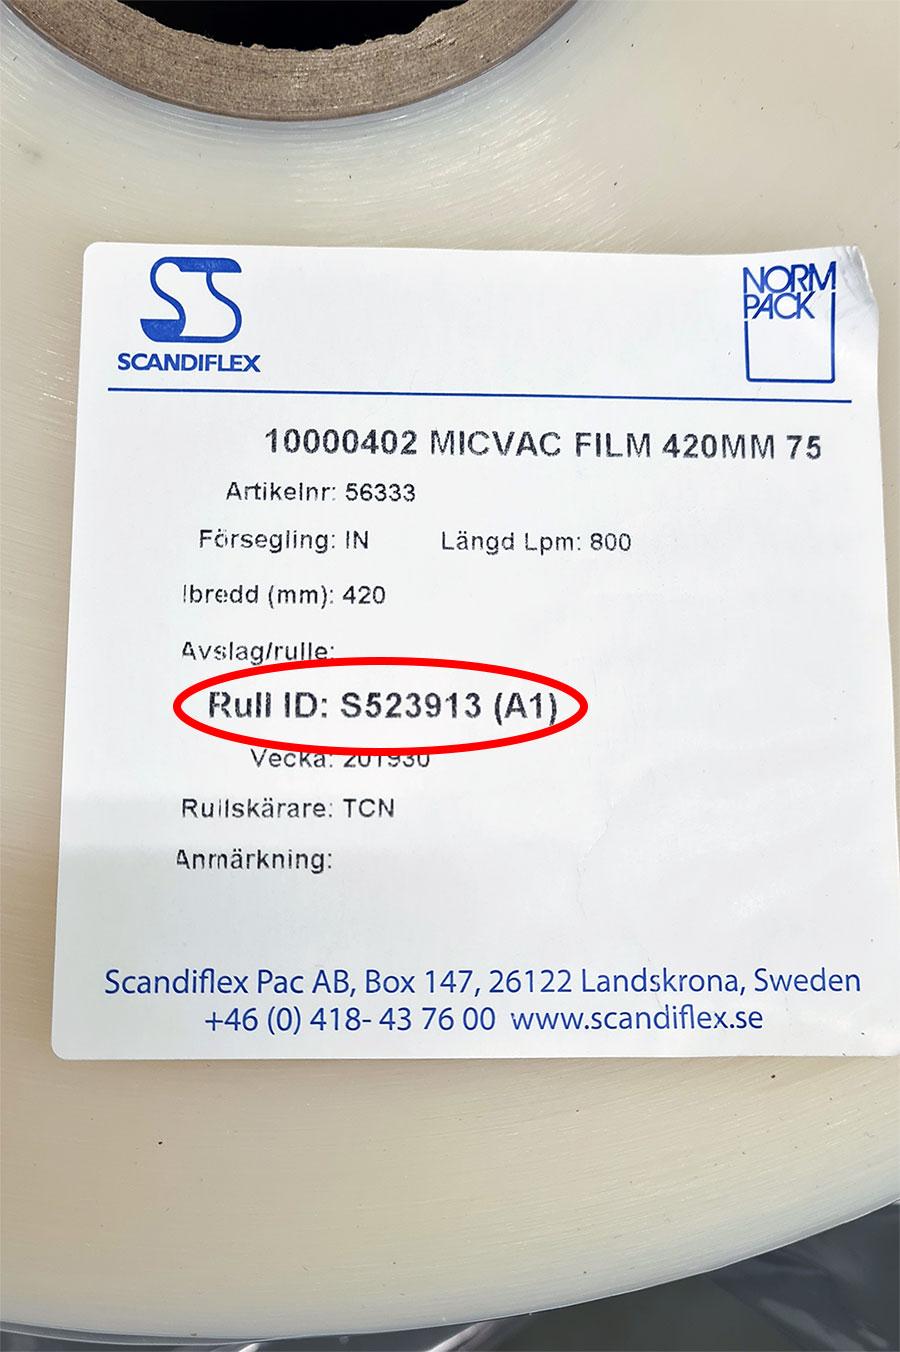 Film, idenfication code